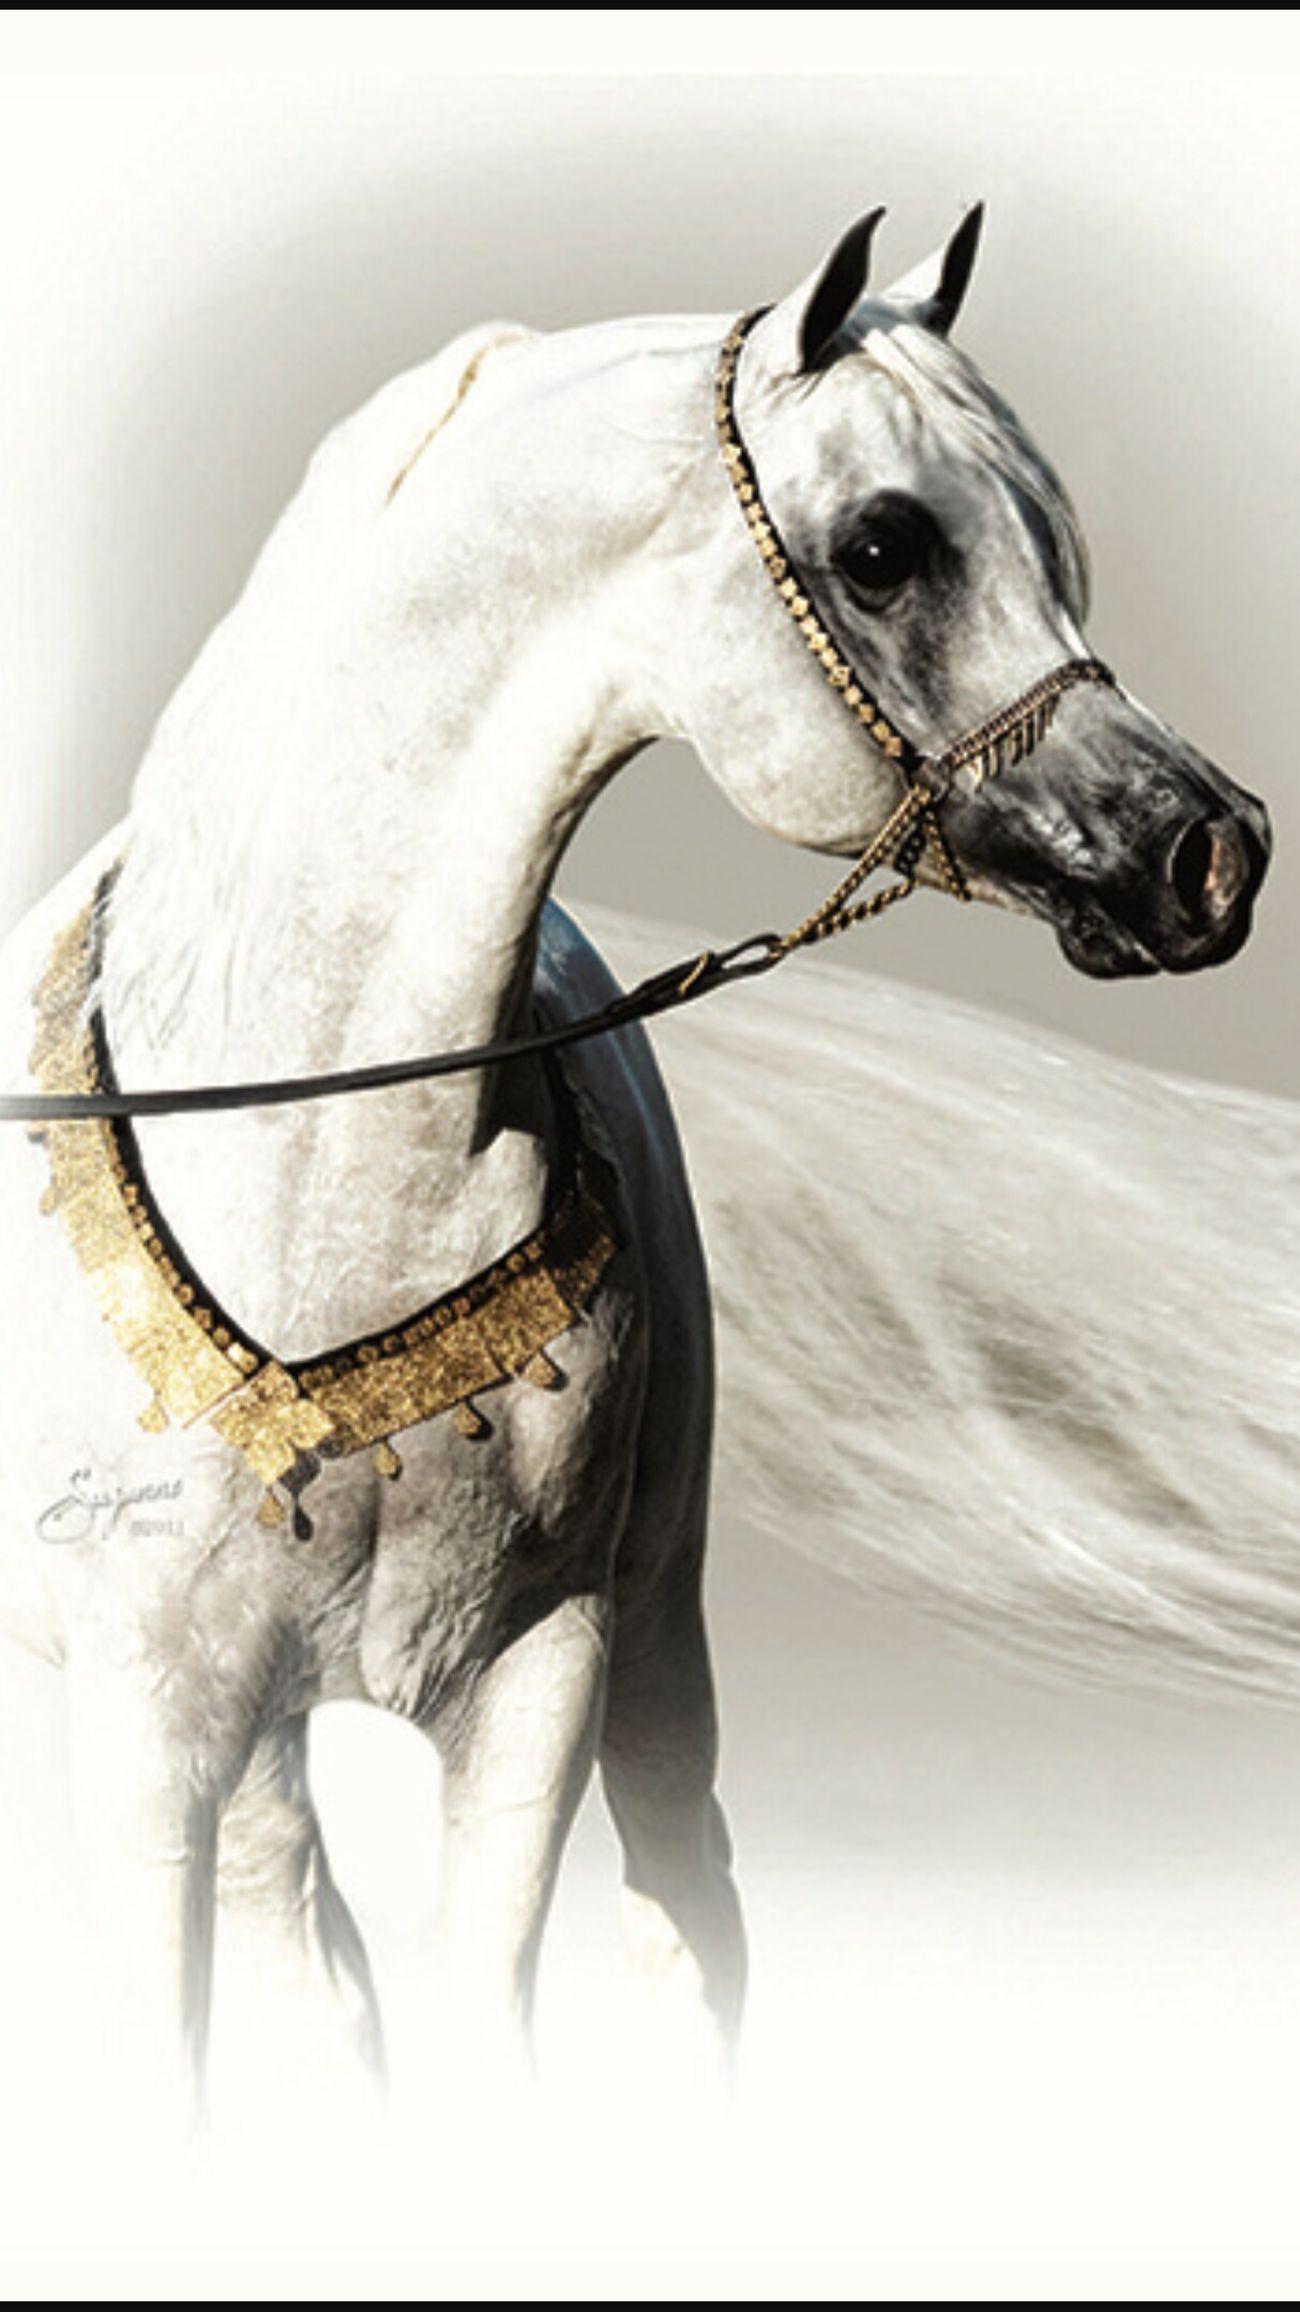 Purebred Arabian Horses are baeeee 😍😍😍😍😍😍😍😍 Art Enjoying Life